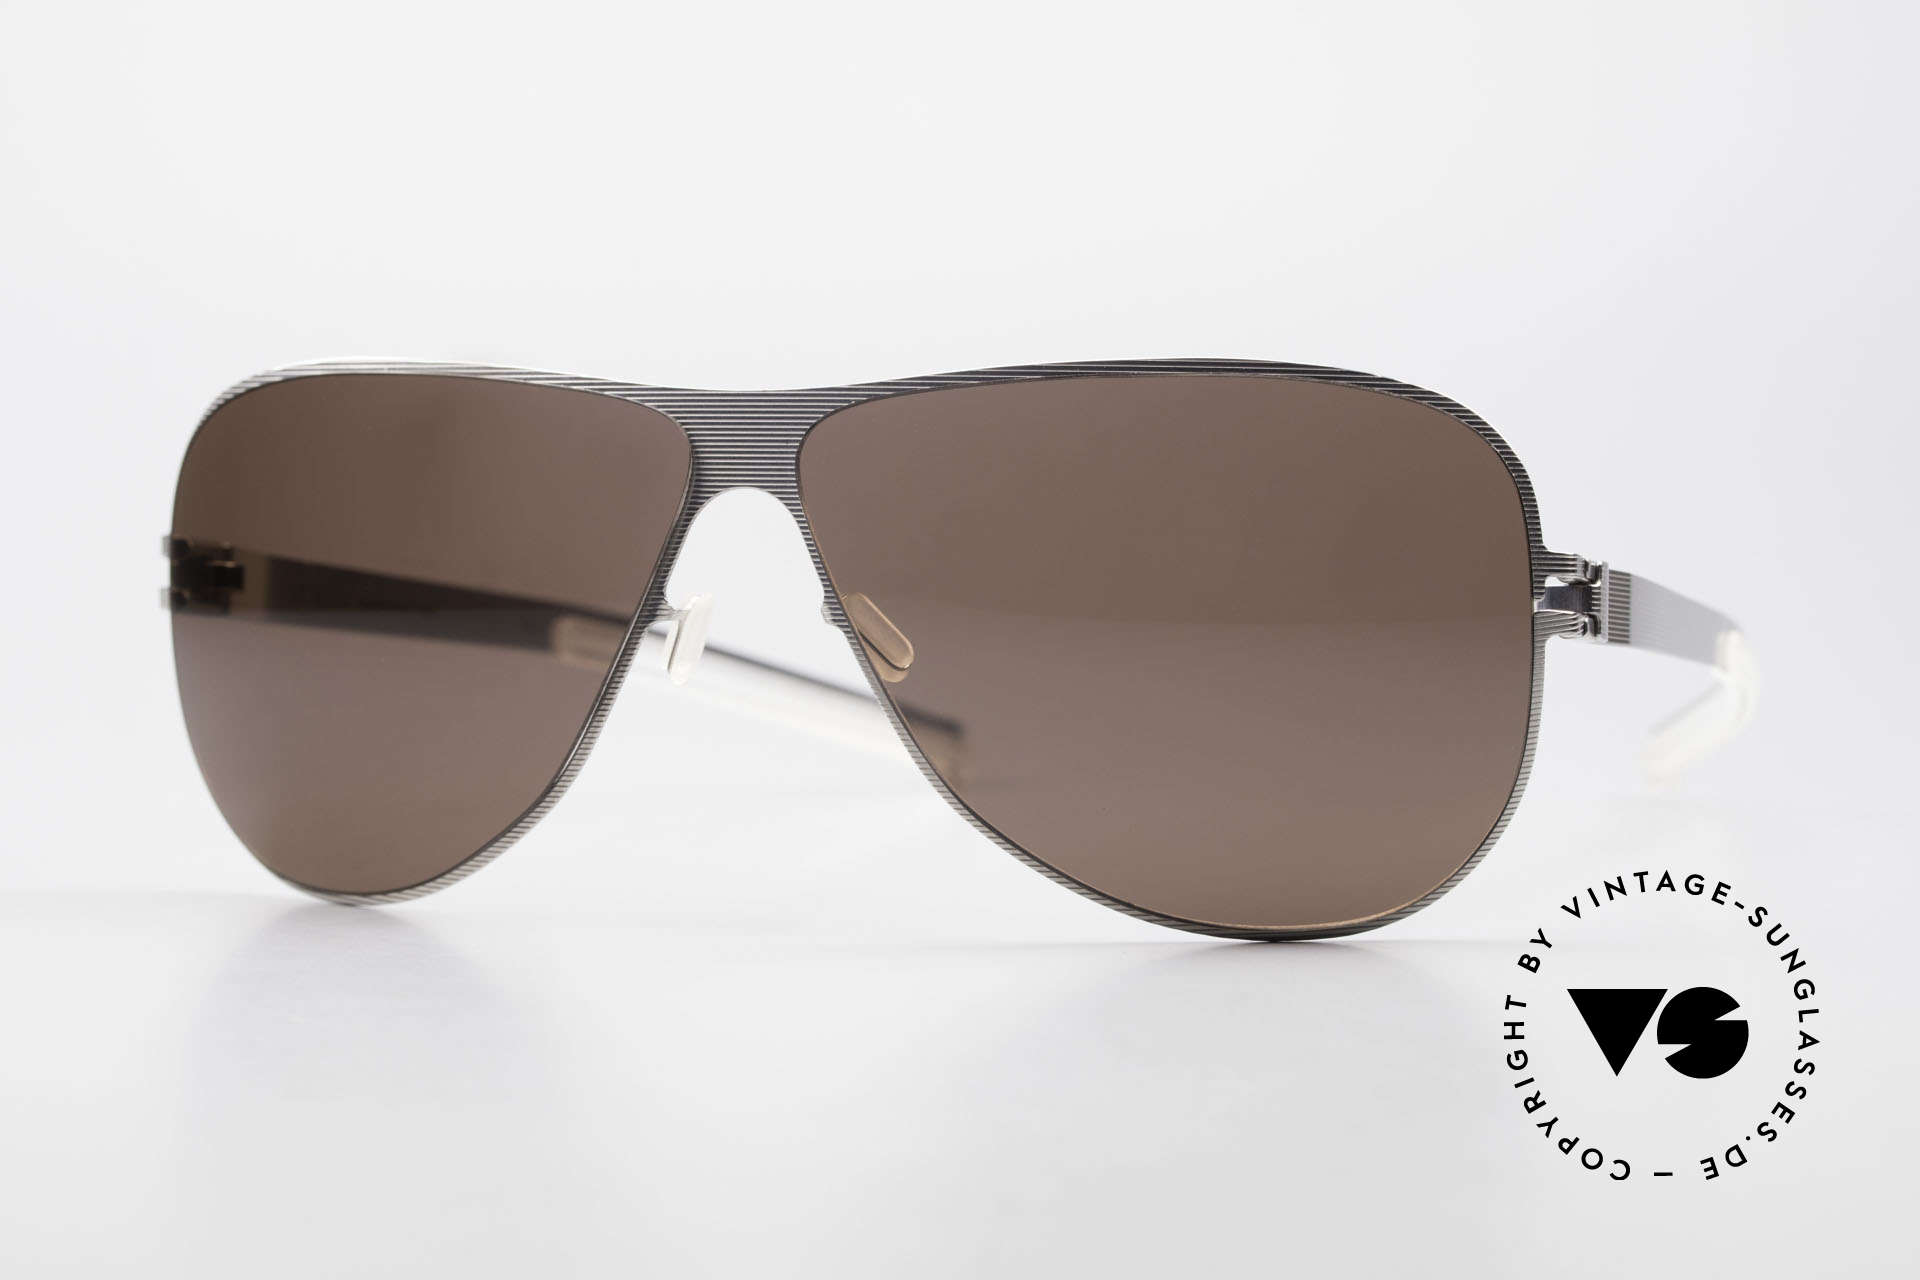 Mykita Ava Ladies Polarized Shades 2007's, original VINTAGE MYKITA ladies sunglasses from 2007, Made for Women